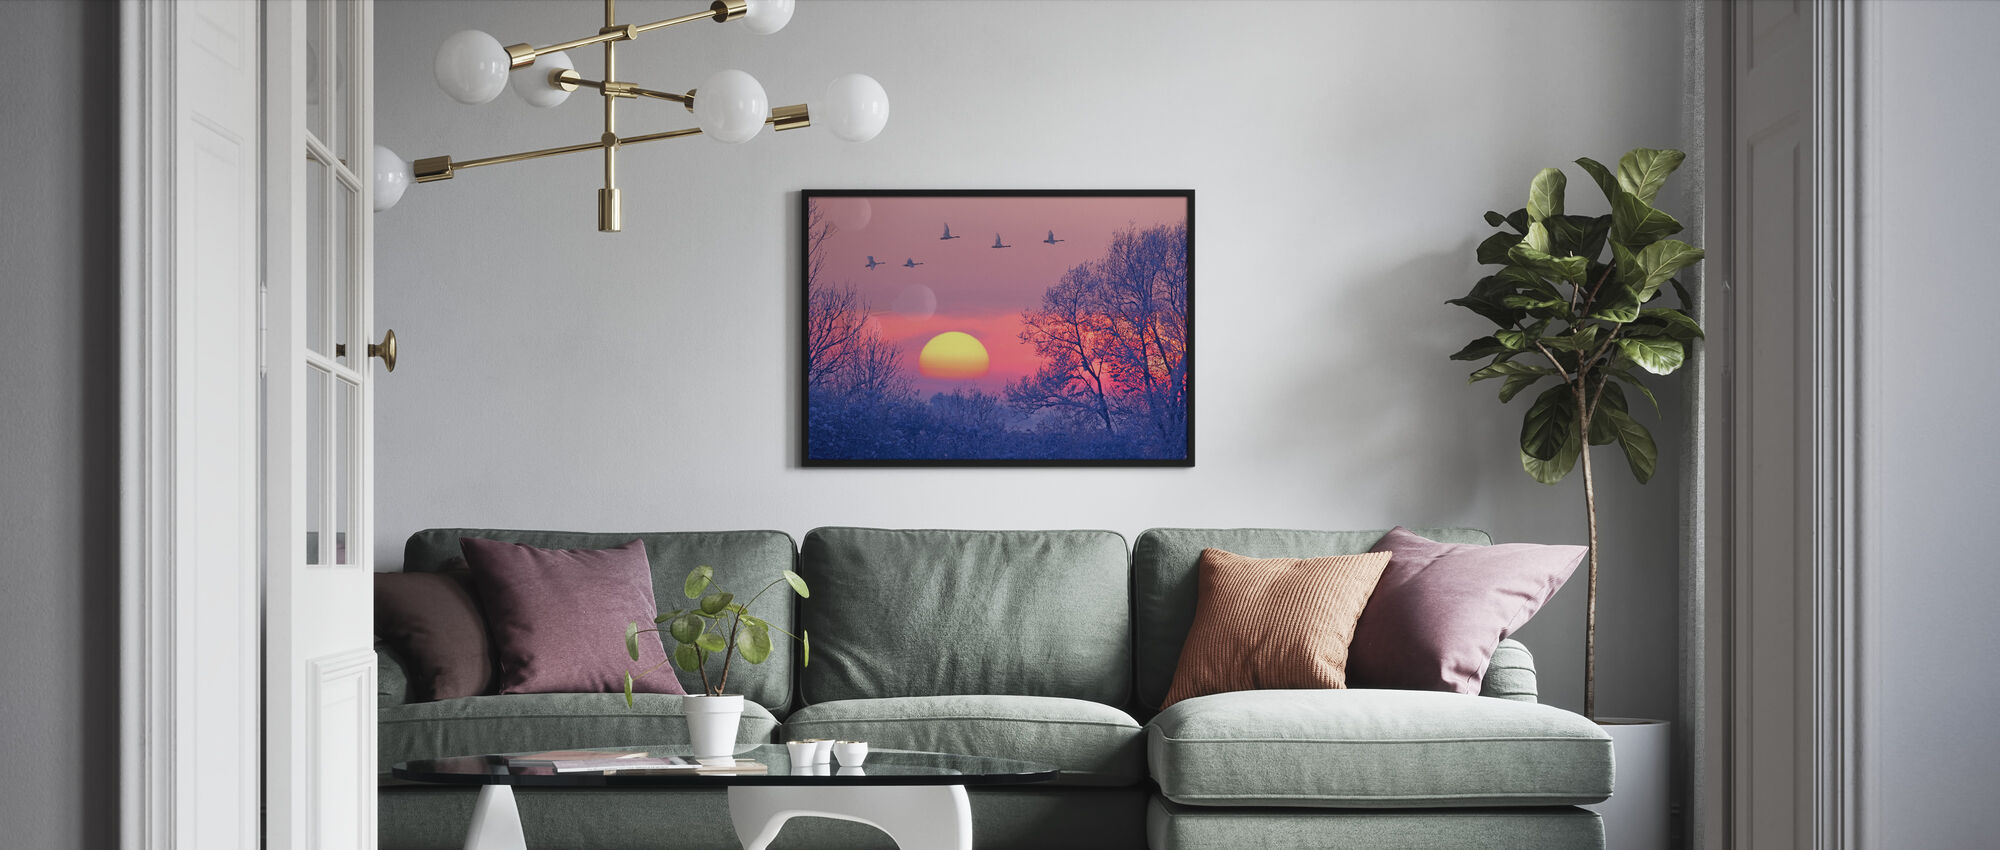 Whooper Swans på Skymning - Inramad tavla - Vardagsrum